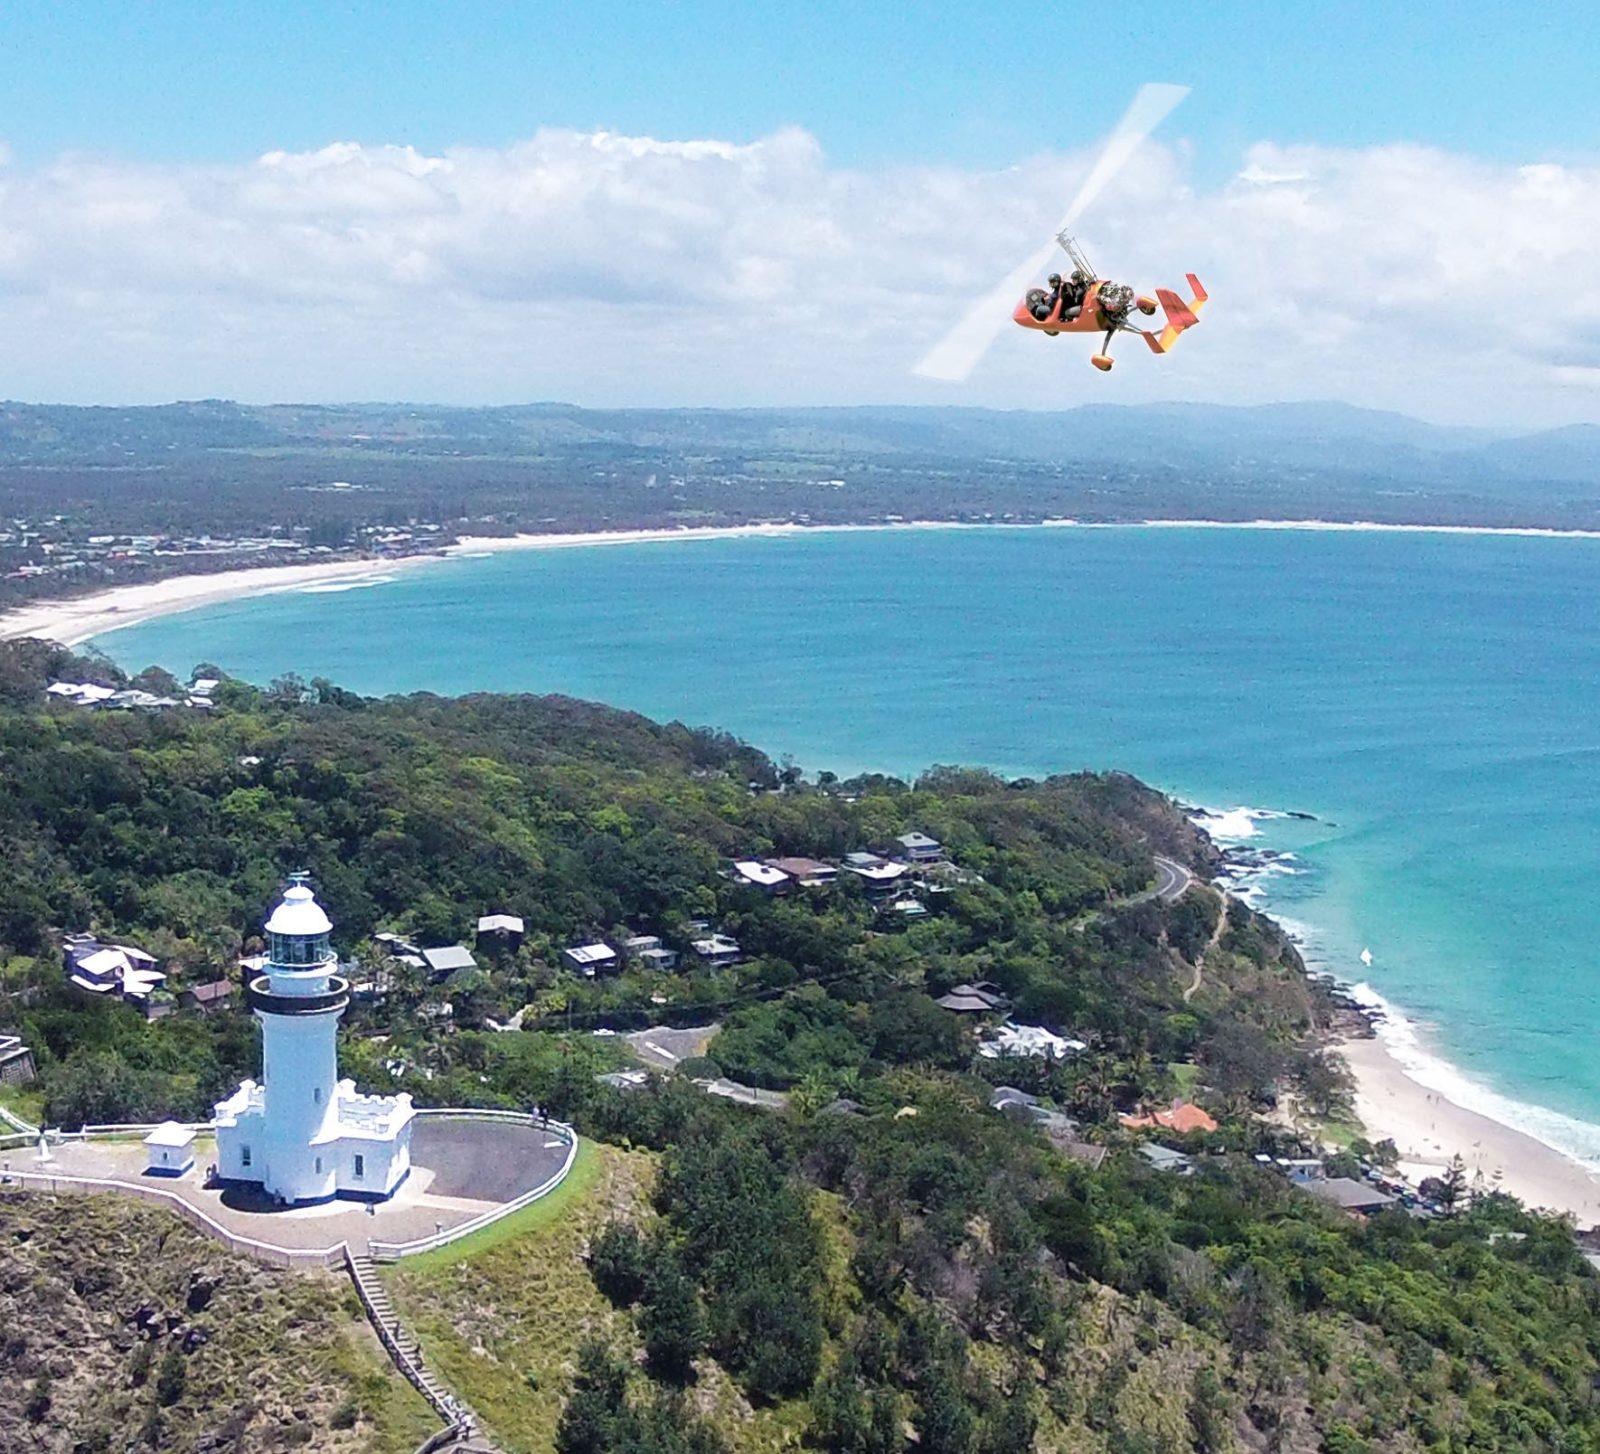 Flight around the lighthouse